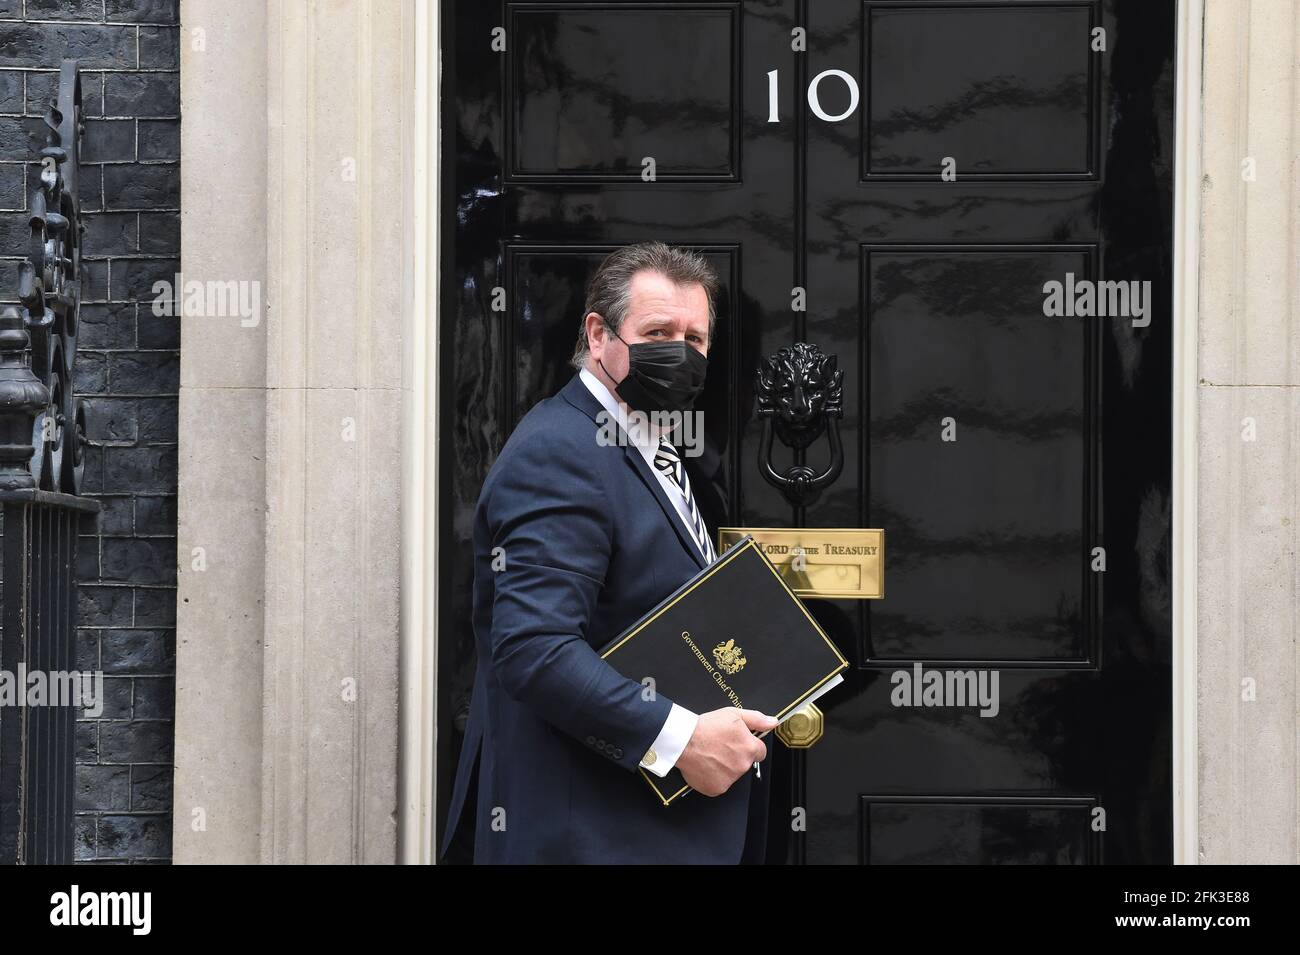 ROYAUME-UNI. 28 avril 2021. Downing Street Londres 28 avril 2021. Mark Spencer le whip en chef arrive au N10. Crédit : MARTIN DALTON/Alay Live News Banque D'Images